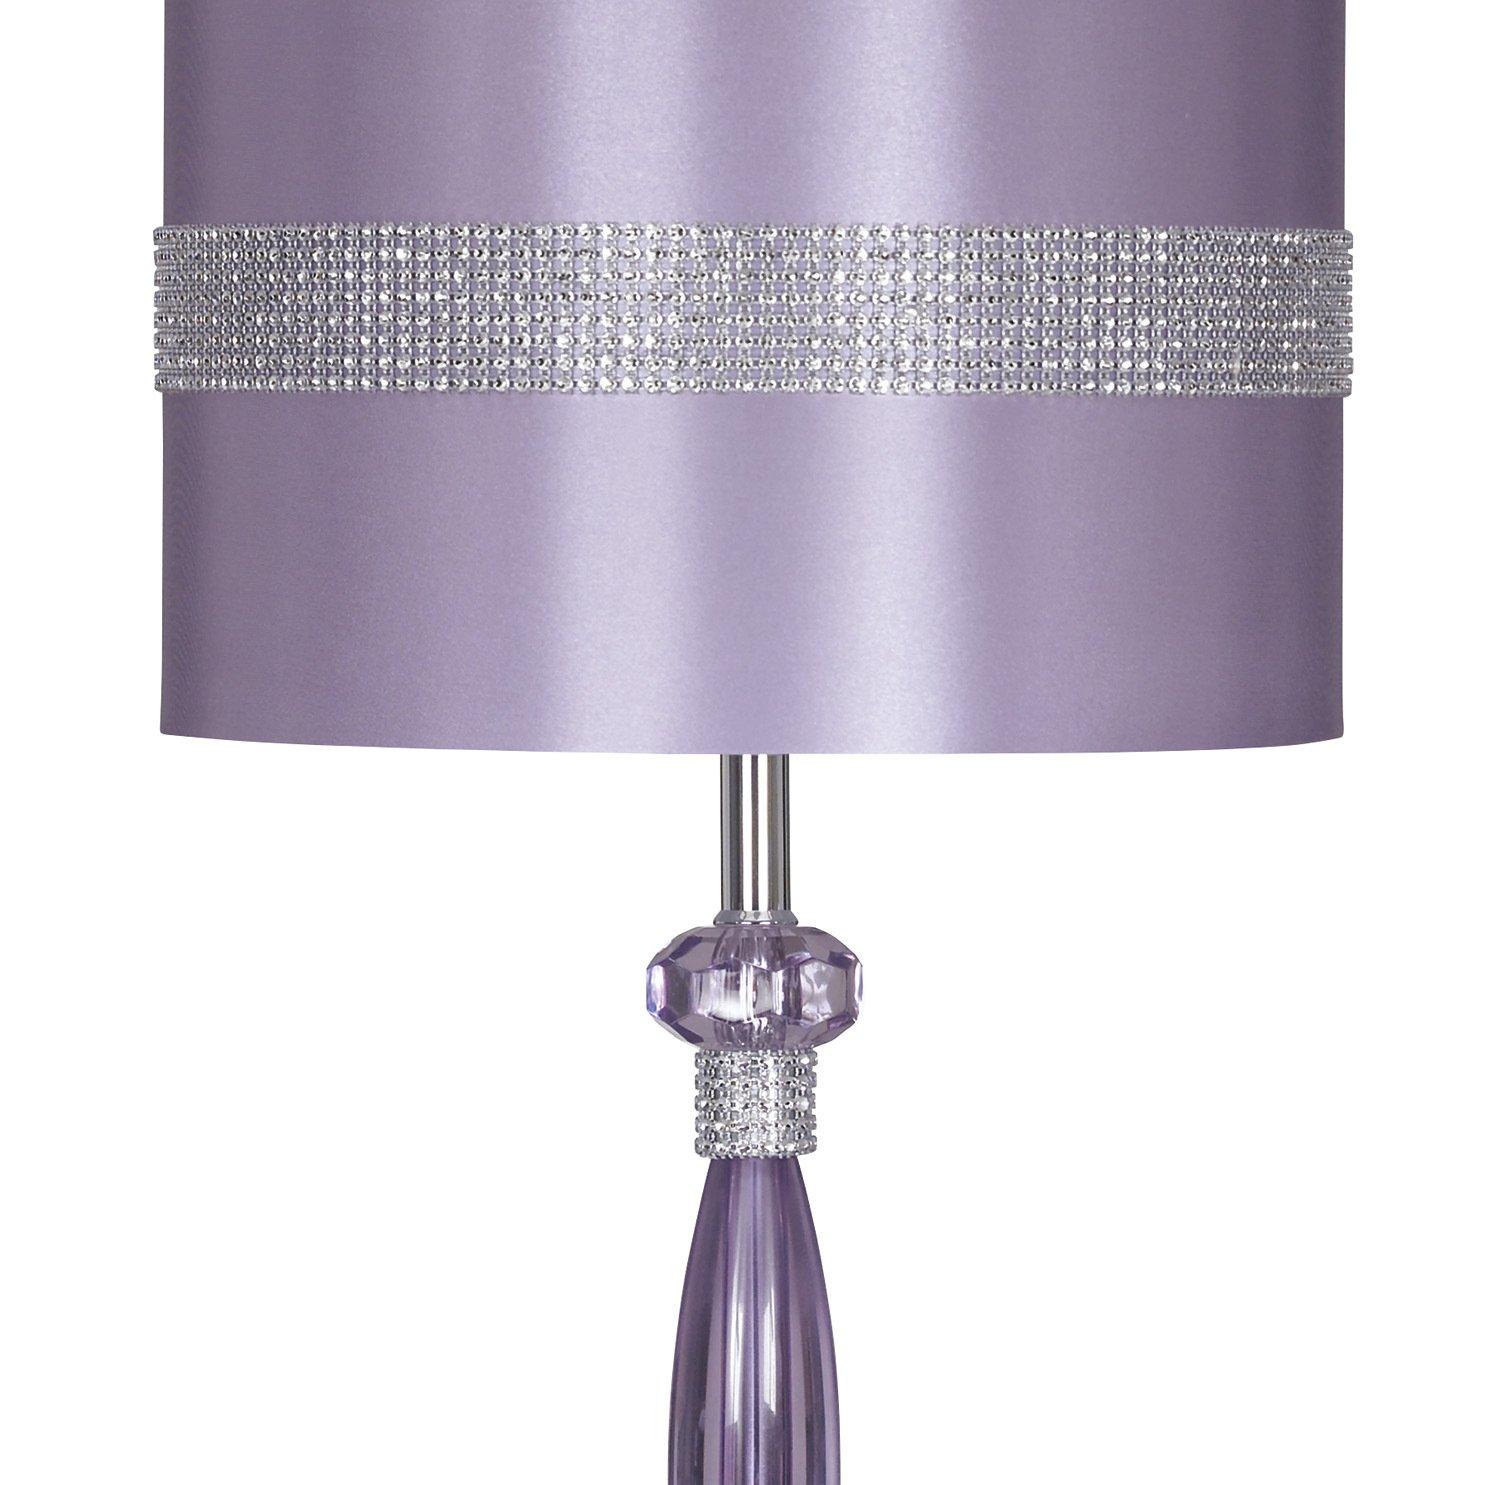 Amazon.com: Púrpura Lámpara de mesa de metal: Home & Kitchen